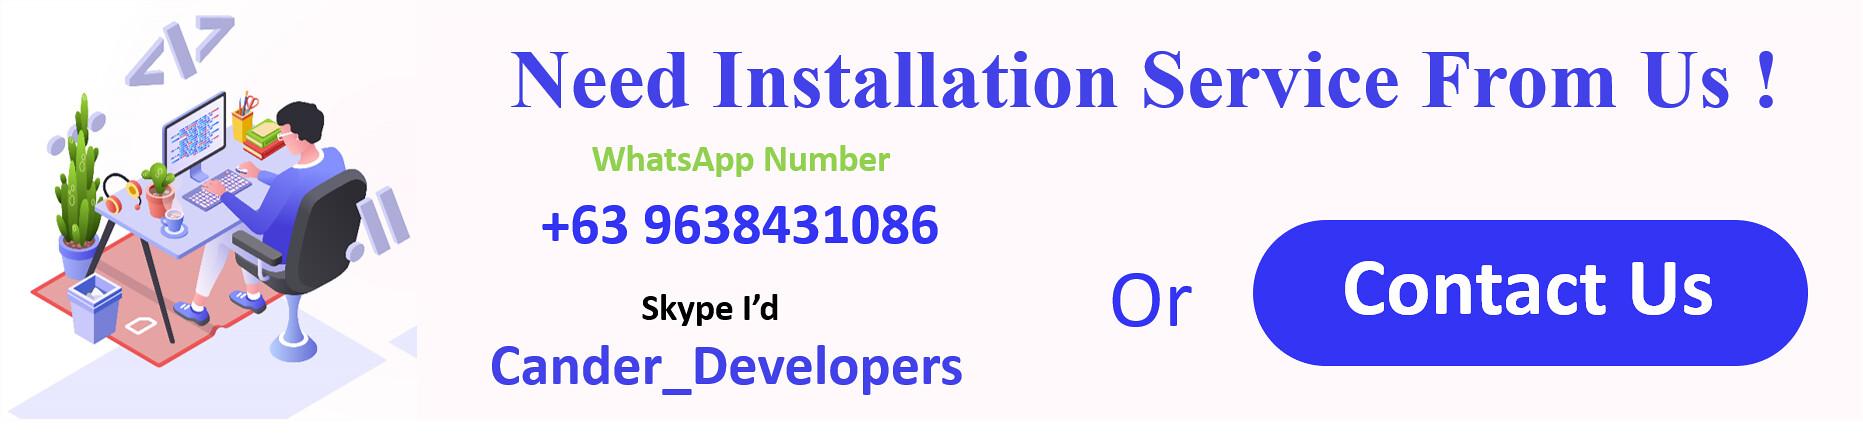 Mark Classified App    App classificado    Gateways de múltiplos pagamentos integrados    Compra e Venda    Assinatura - 1